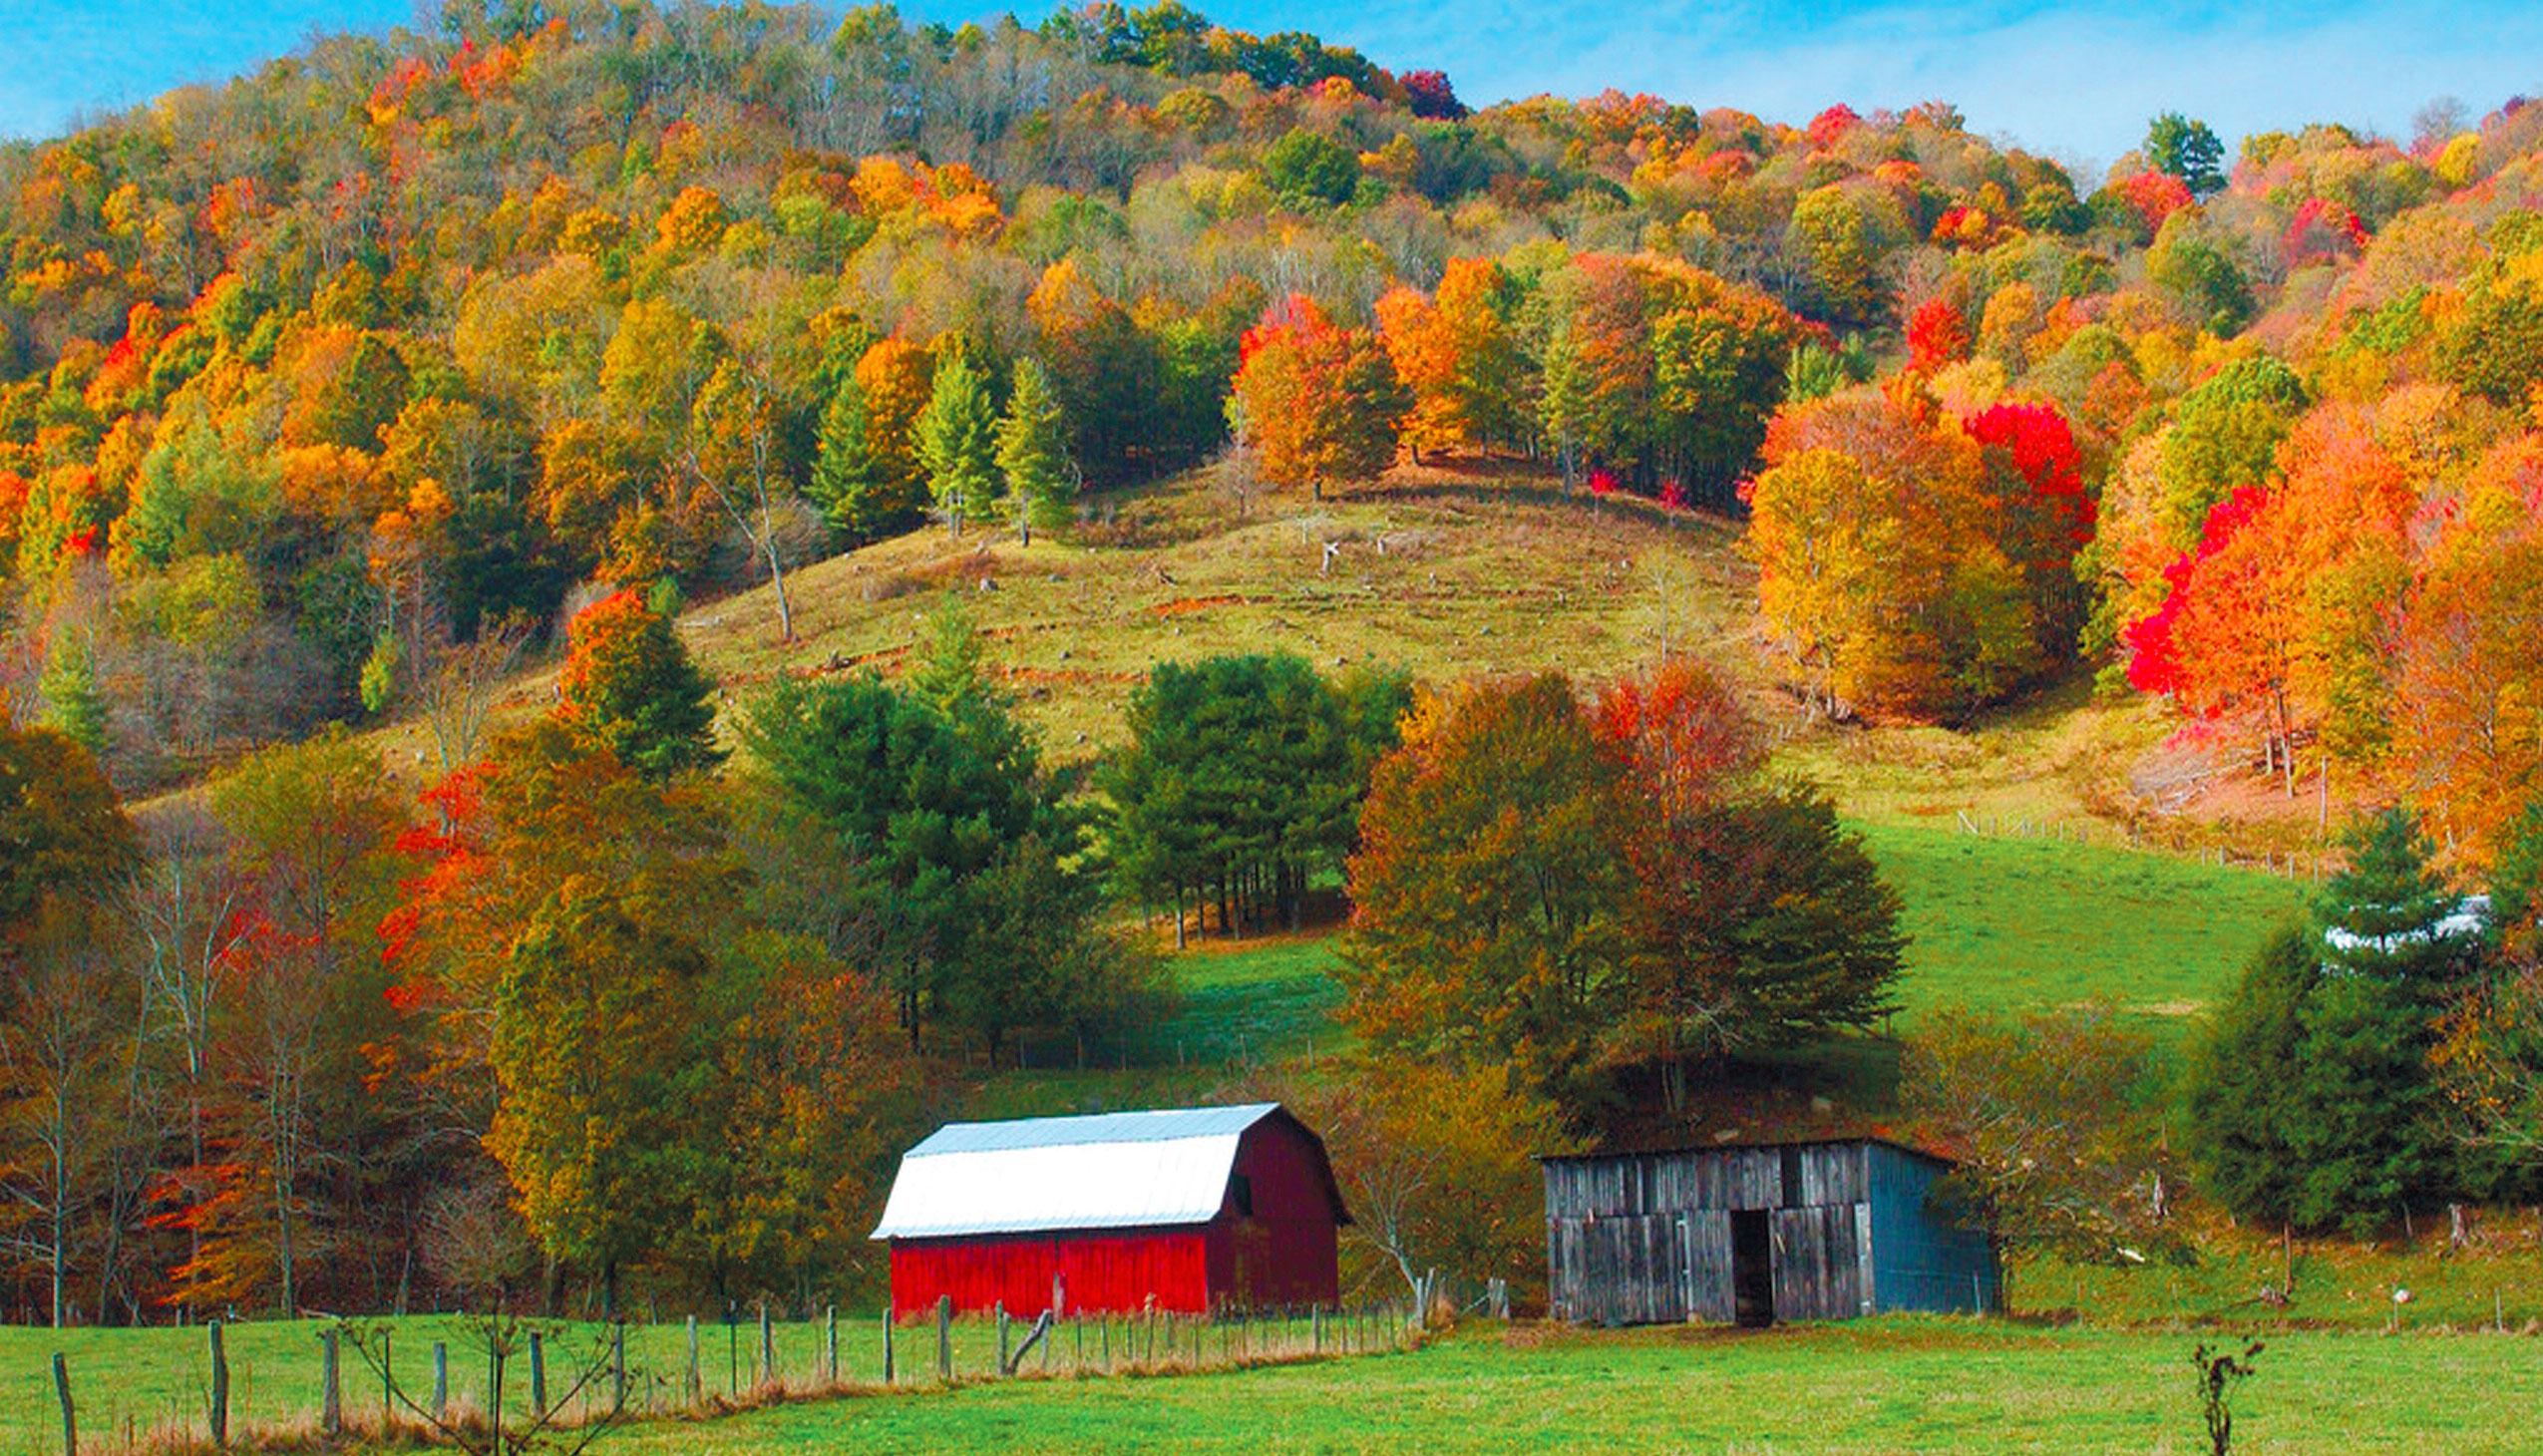 Farm Tour of Western North Carolina | Edible Piedmont